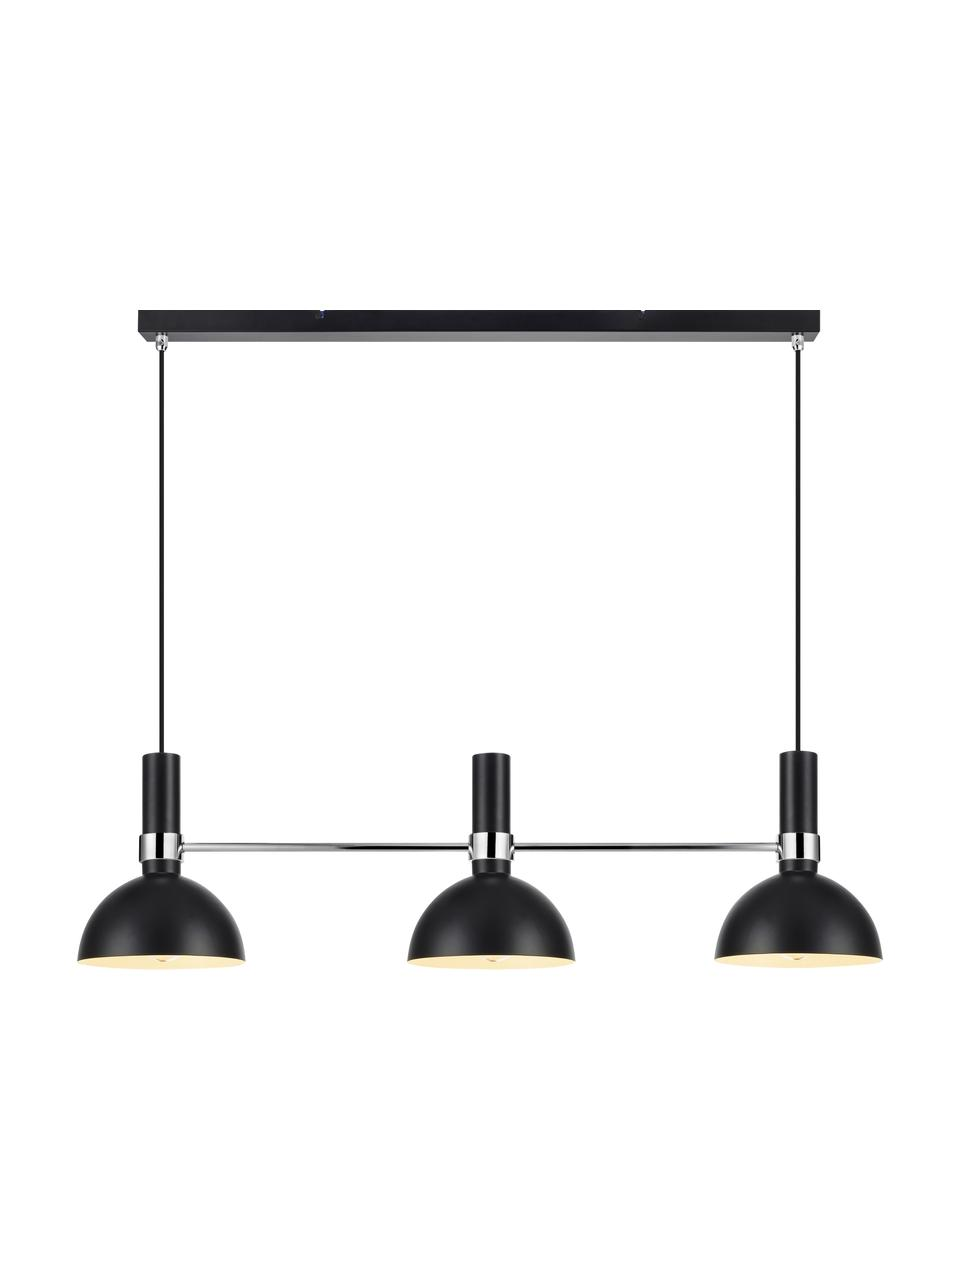 Große Pendelleuchte Larry, Baldachin: Messing, lackiert, Schwarz,Chrom, 100 x 24 cm